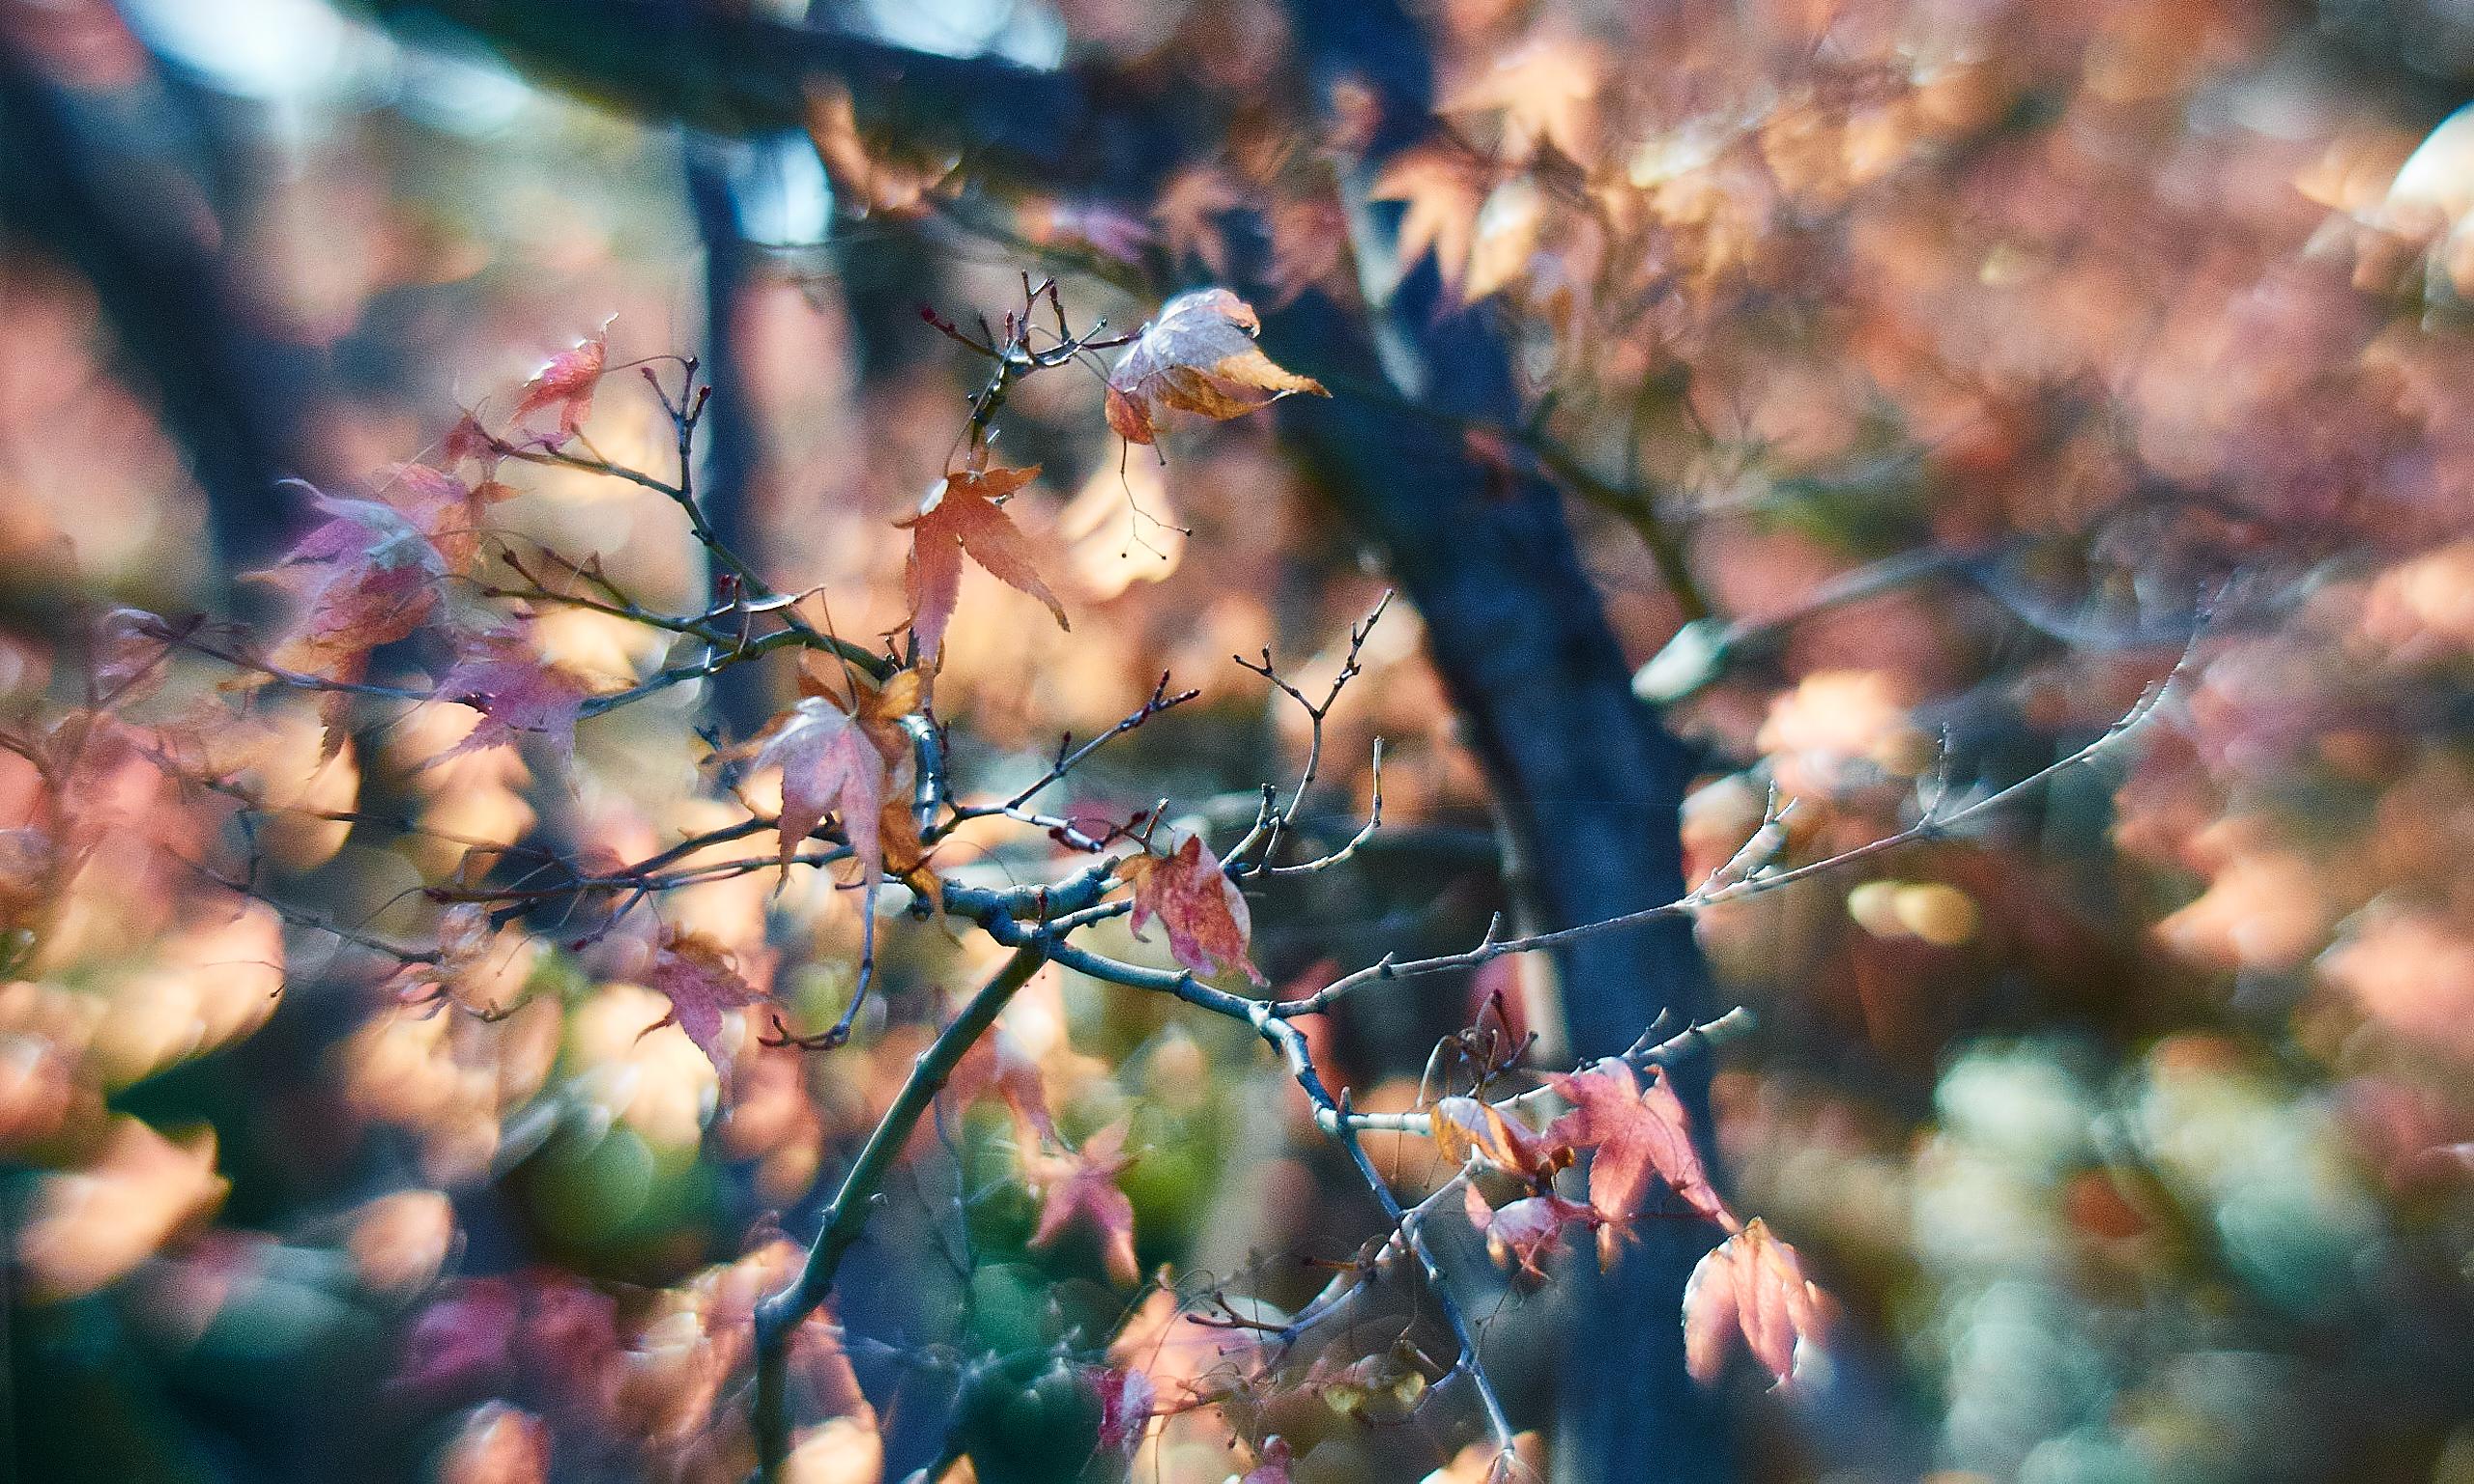 20140104 1152 Fort Worth Botanic Gardens D700 42 ©JamesECockroft 20140104 Capture One